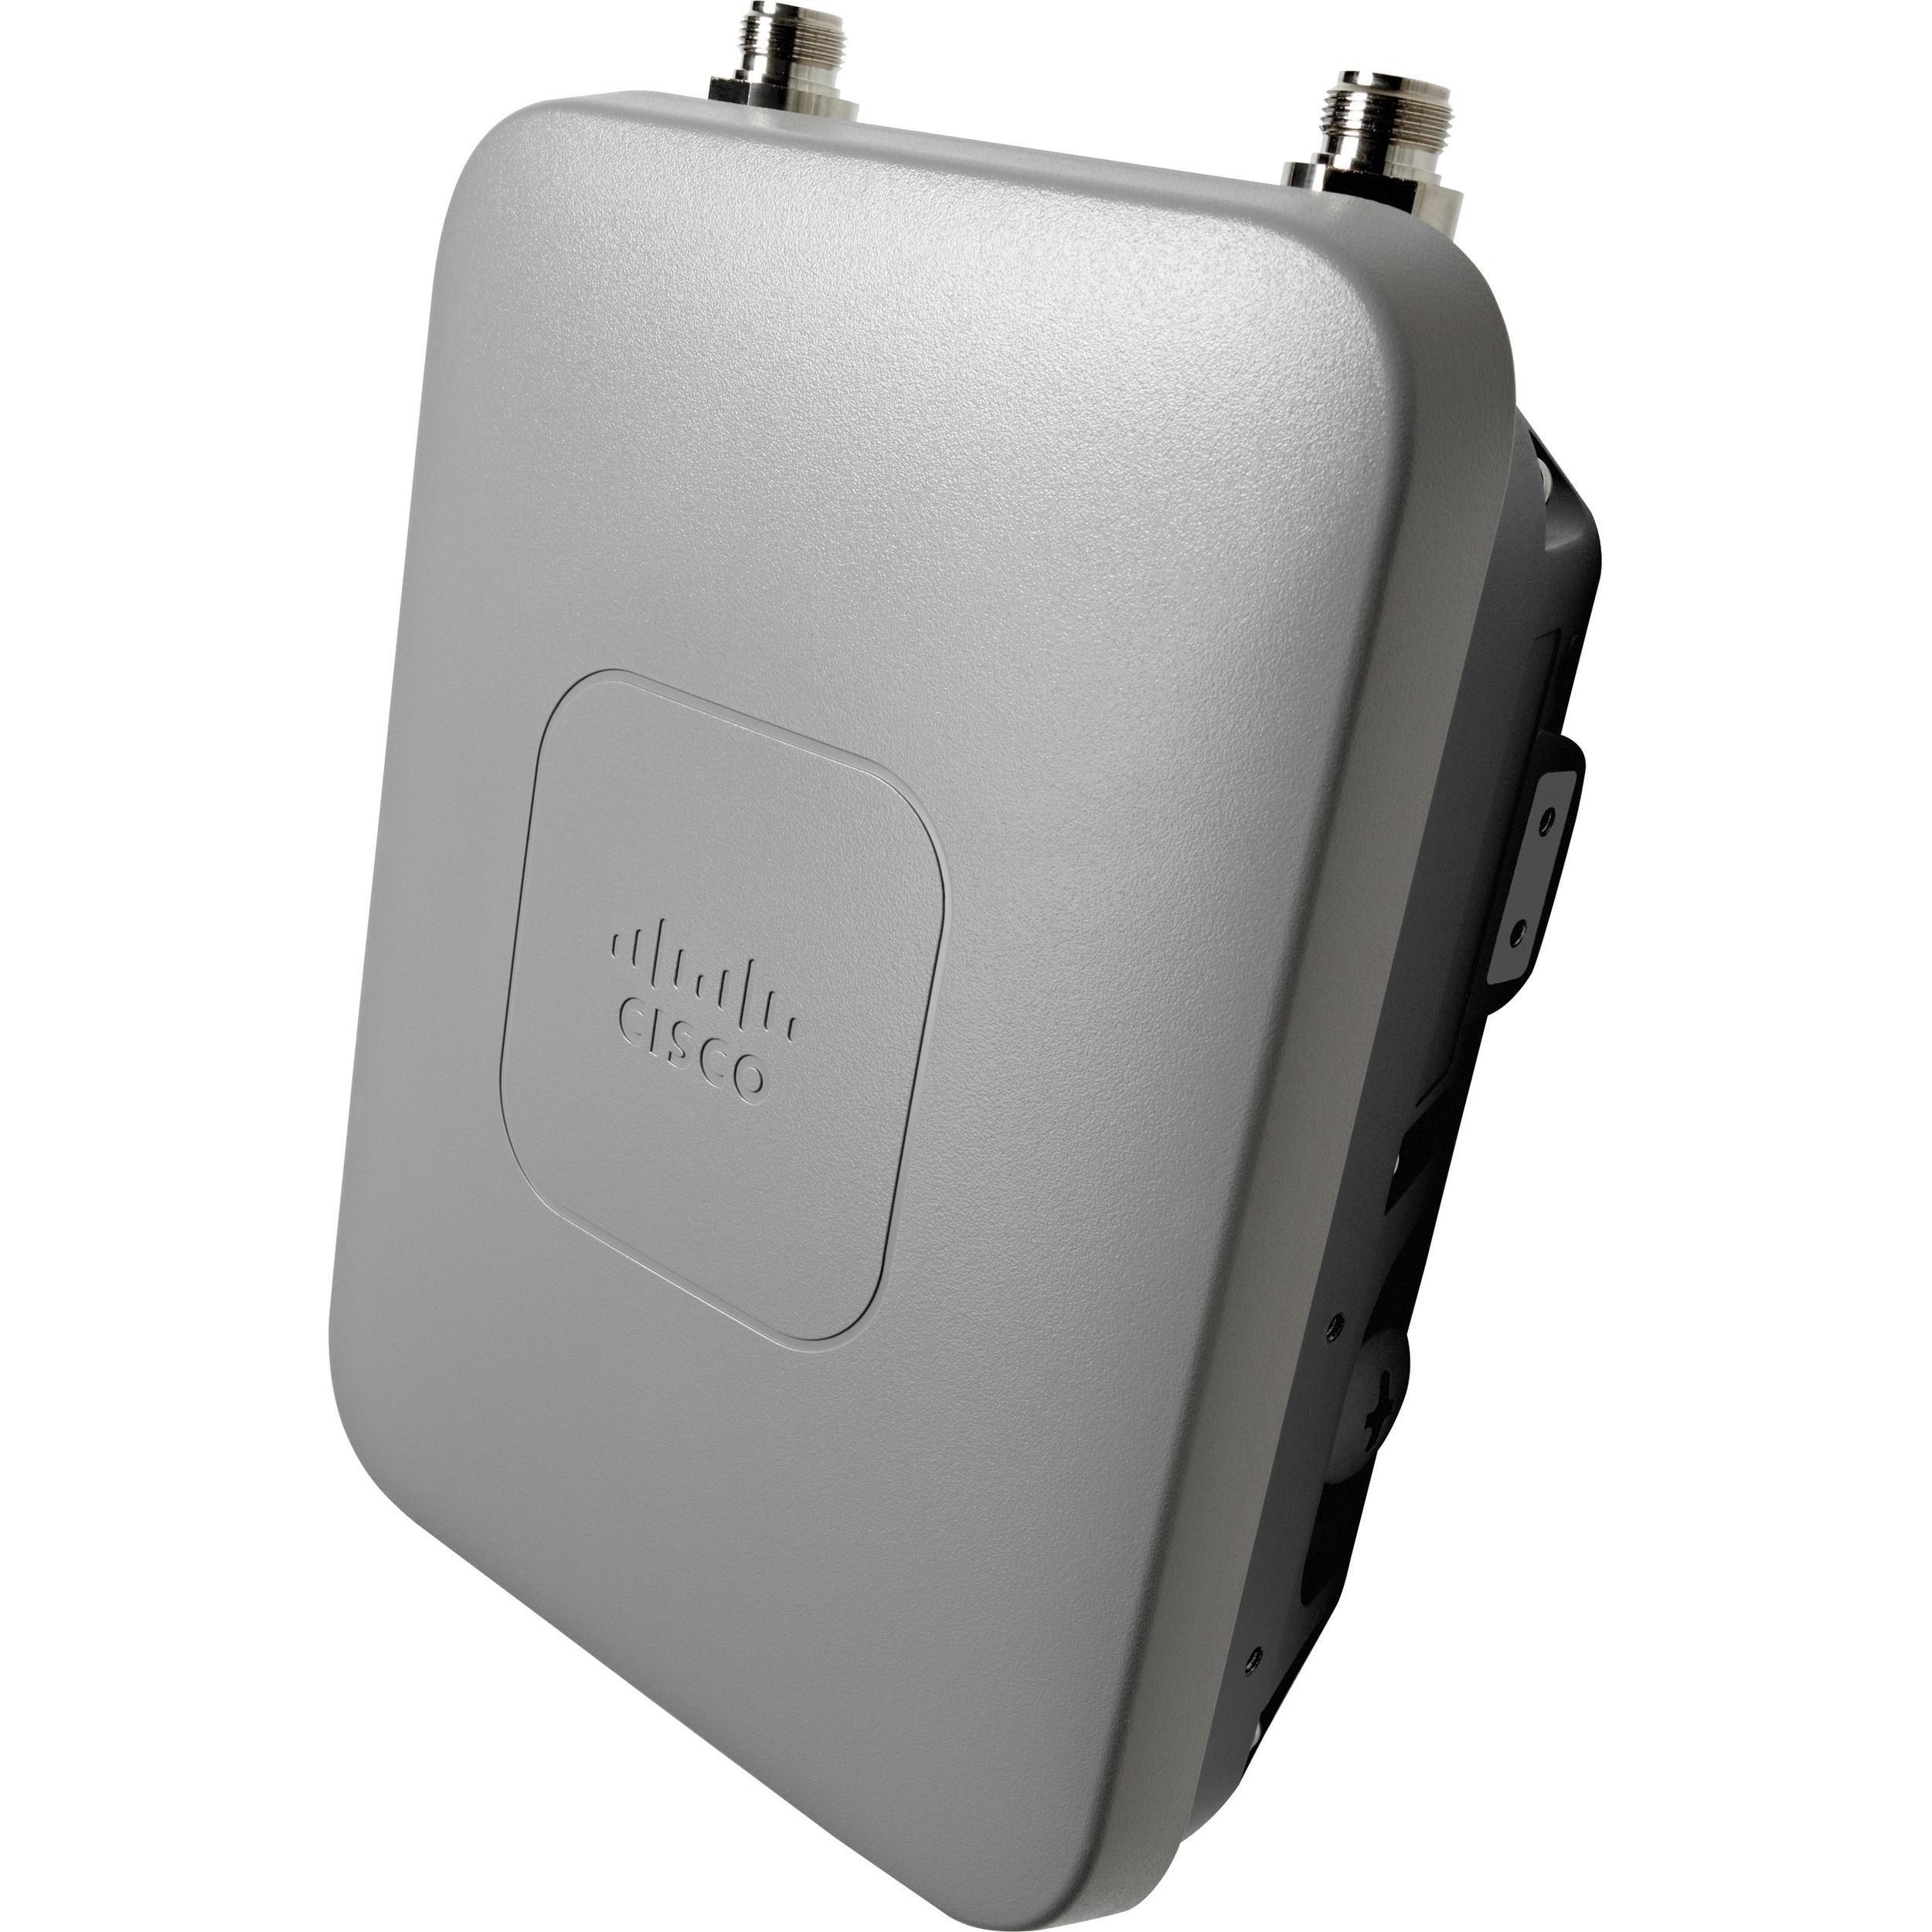 Cisco Aironet 1532E Ieee 802.11n 300 Mbit/s Wireless Acce...